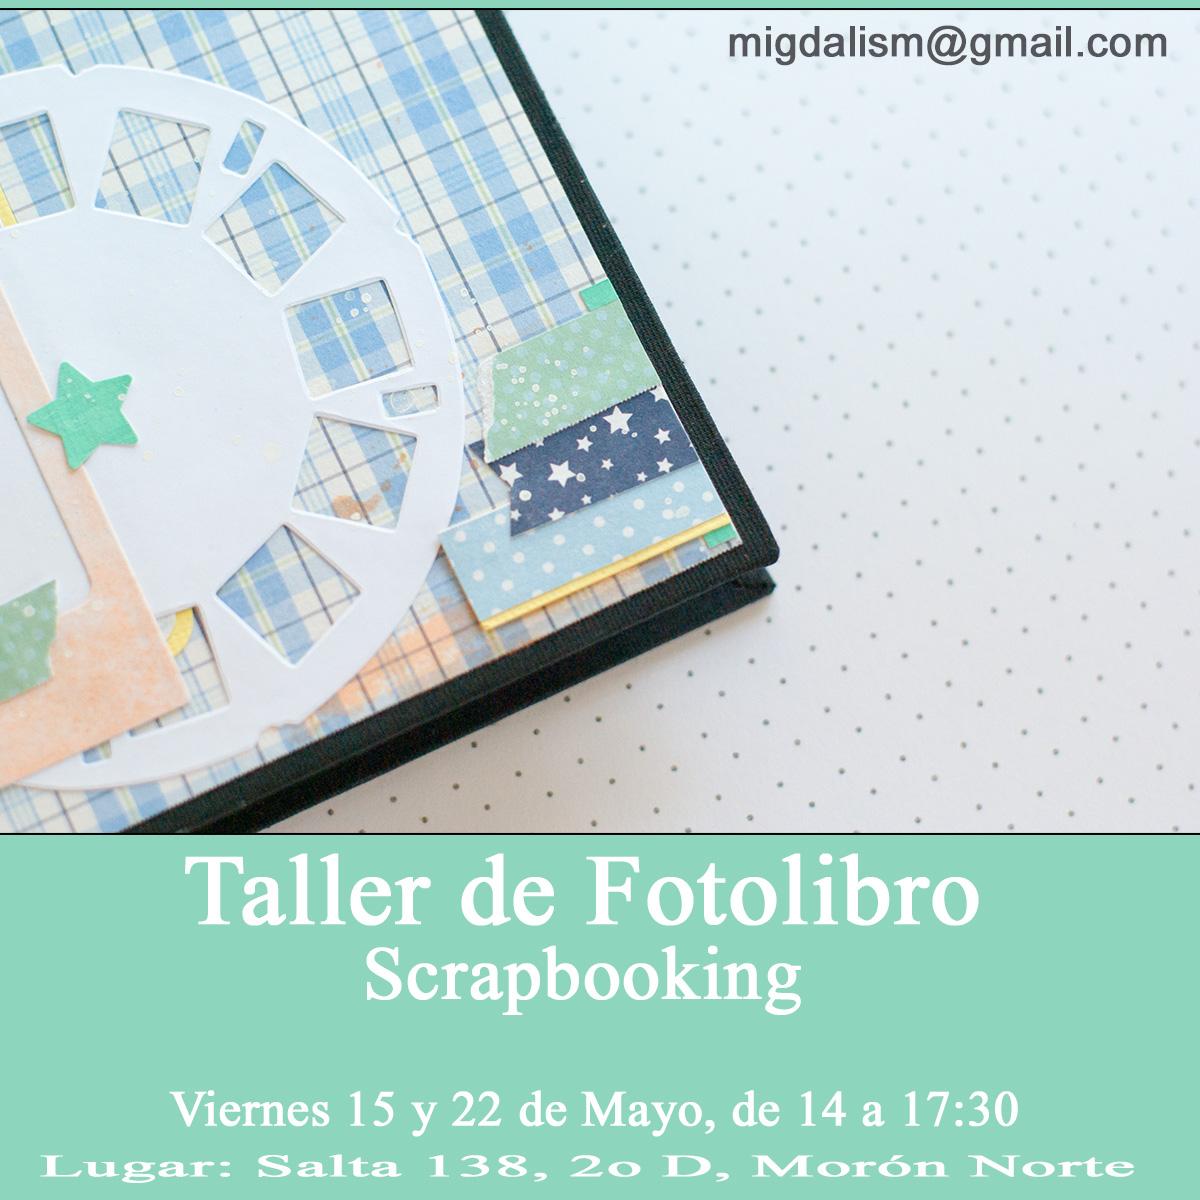 taller fotolibro scrapbooking